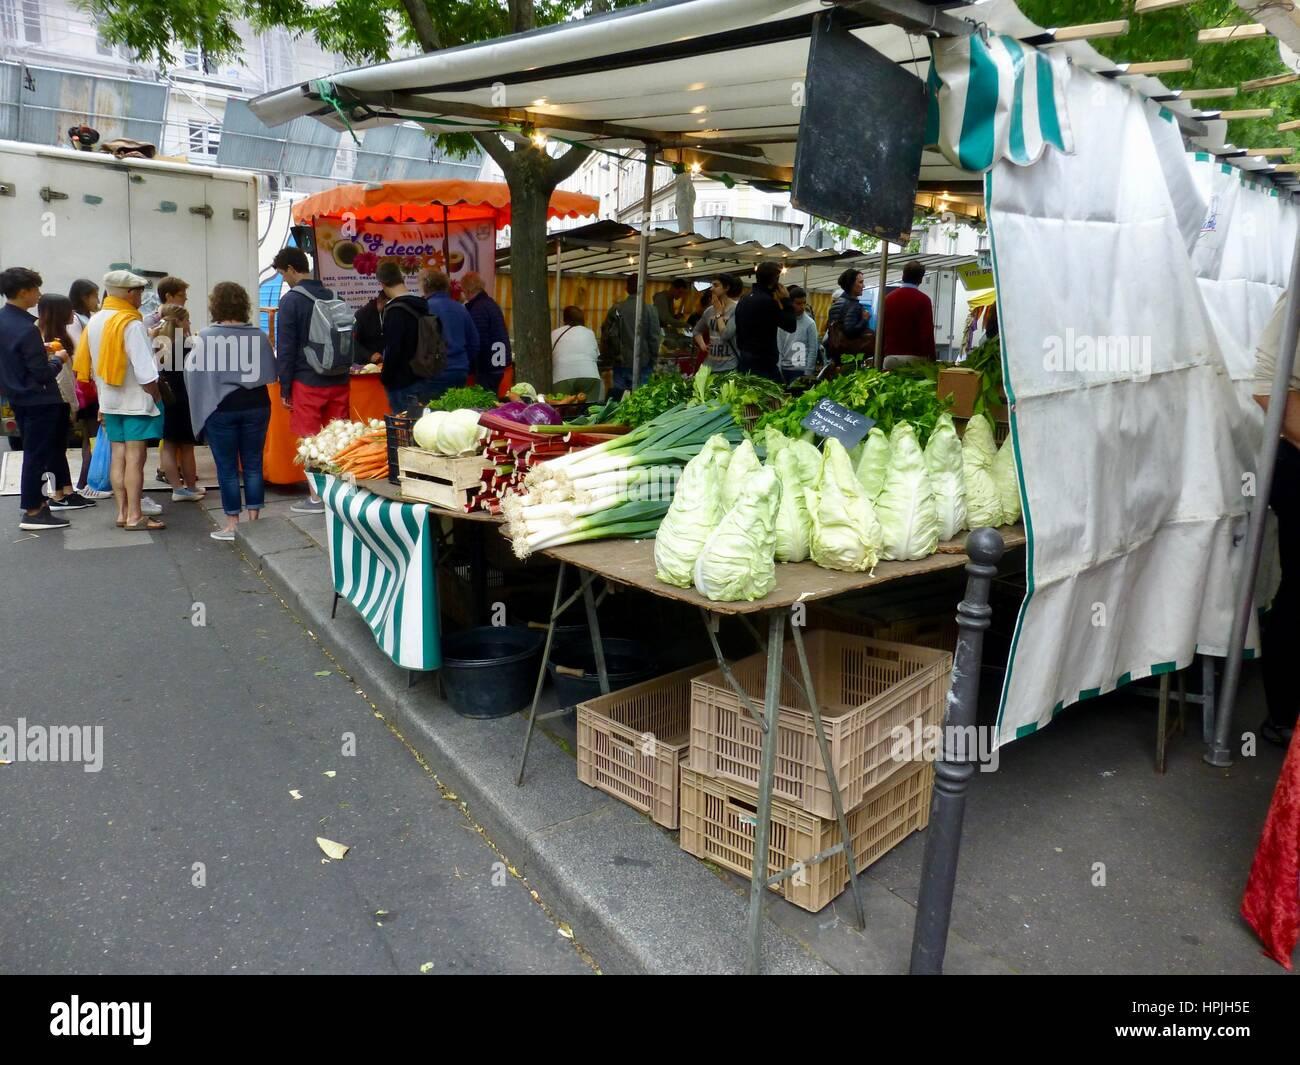 Neatly displayed vegetables at Bastille Market on Boulevard Richard Lenoir, Paris France - Stock Image